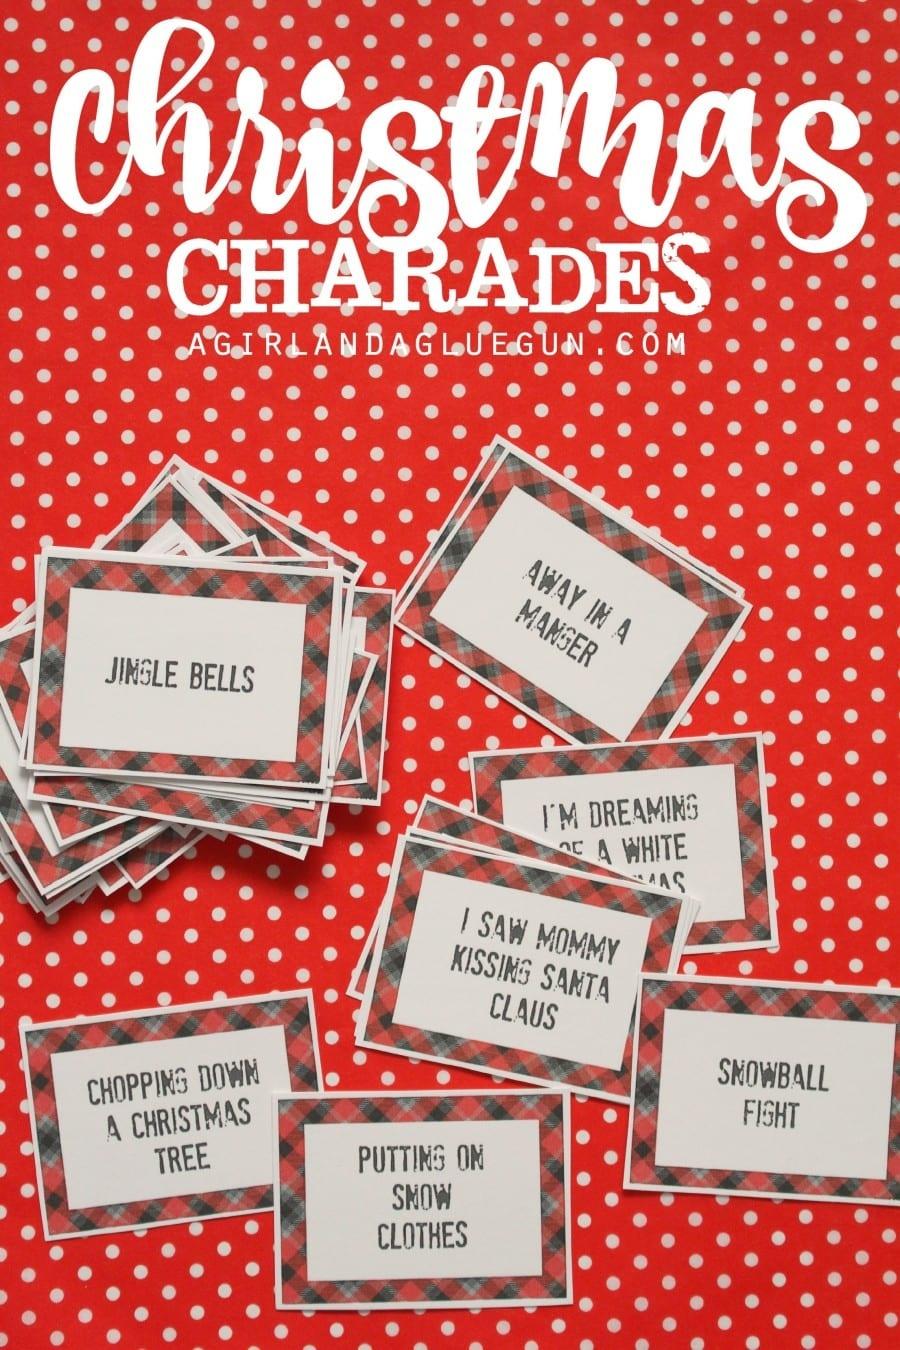 Christmas Charades Game And Free Printable Roundup! - A Girl And A - Free Printable Christmas Pictionary Cards